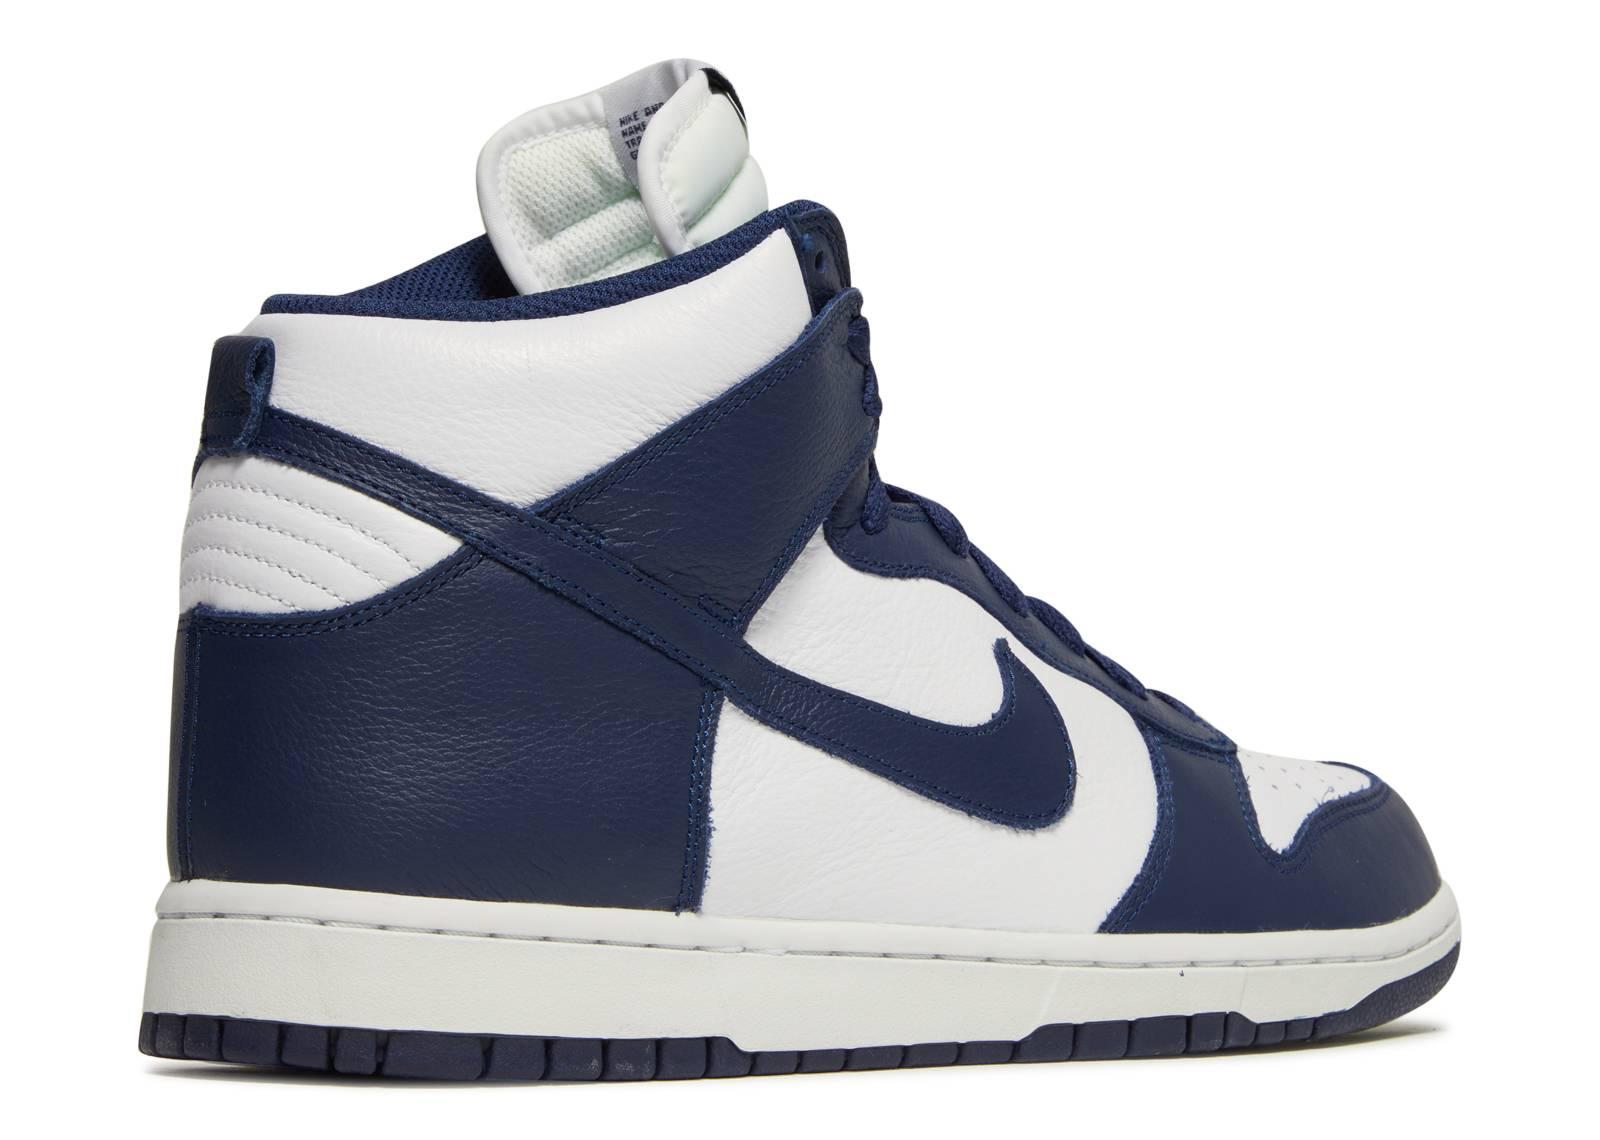 separation shoes 4788a f36a4 ... promo code dunk retro qs be true villanova nike 850477 103 white  midnight navy flight club